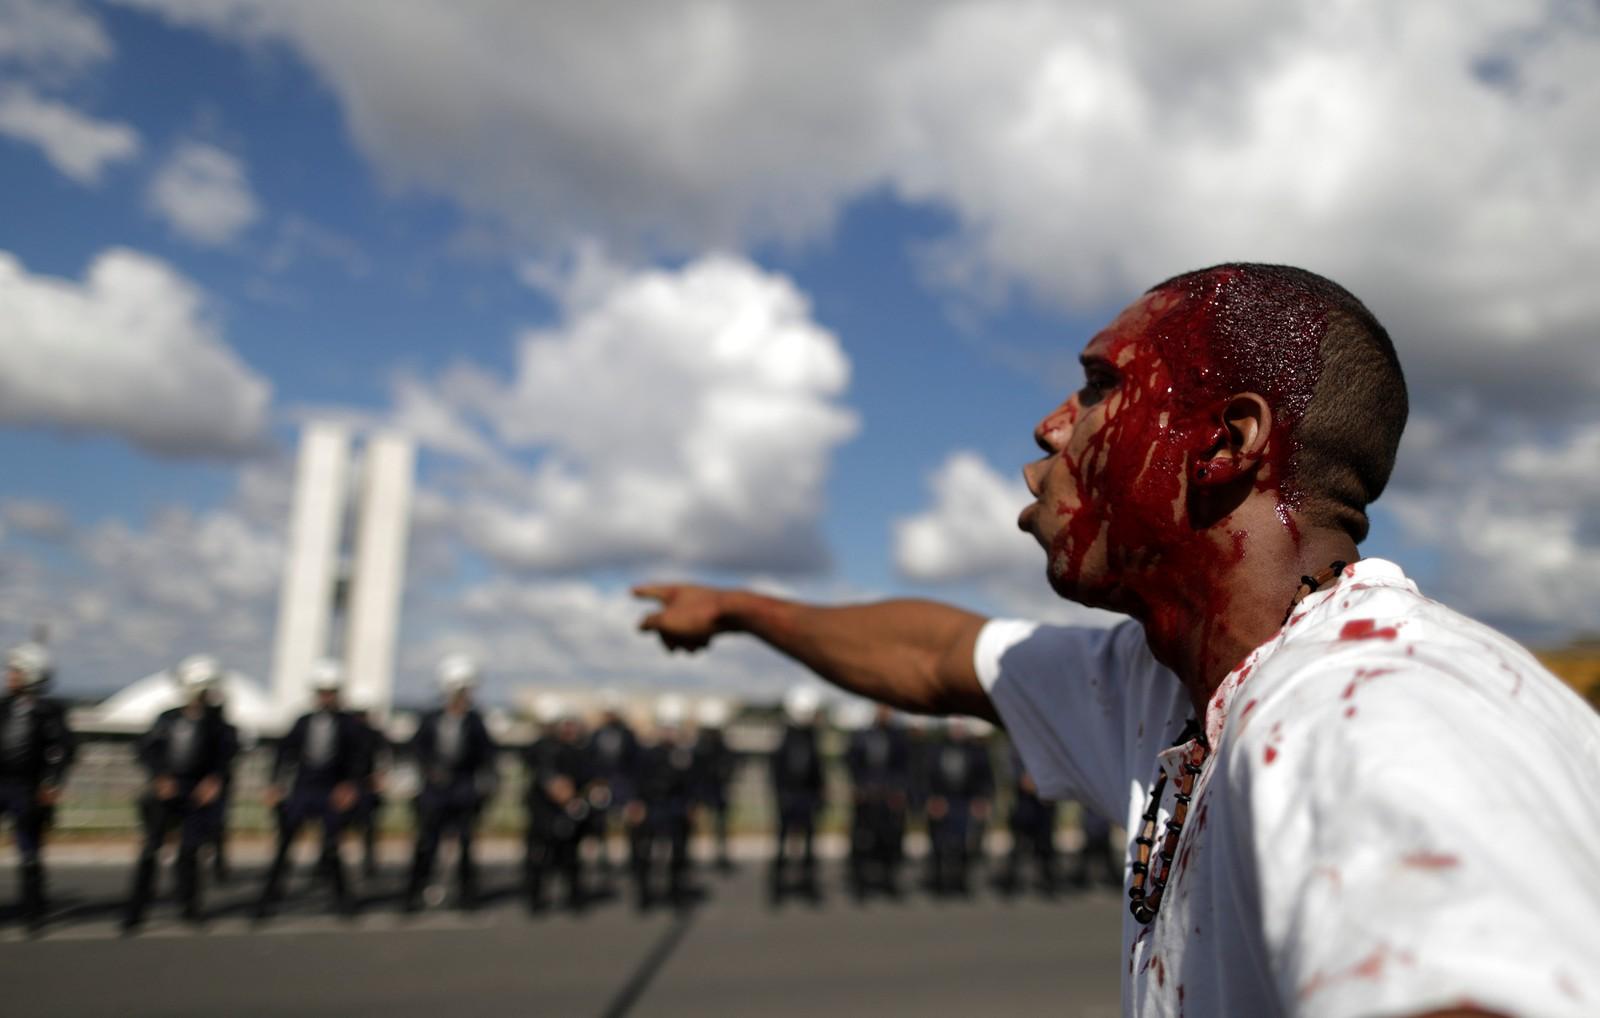 PRESIDENTE BRASILEÑO SACA EJÉRCITO A LA CALLE TRAS VIOLENTAS PROTESTAS E INCENDIO DE UN MINISTERIO